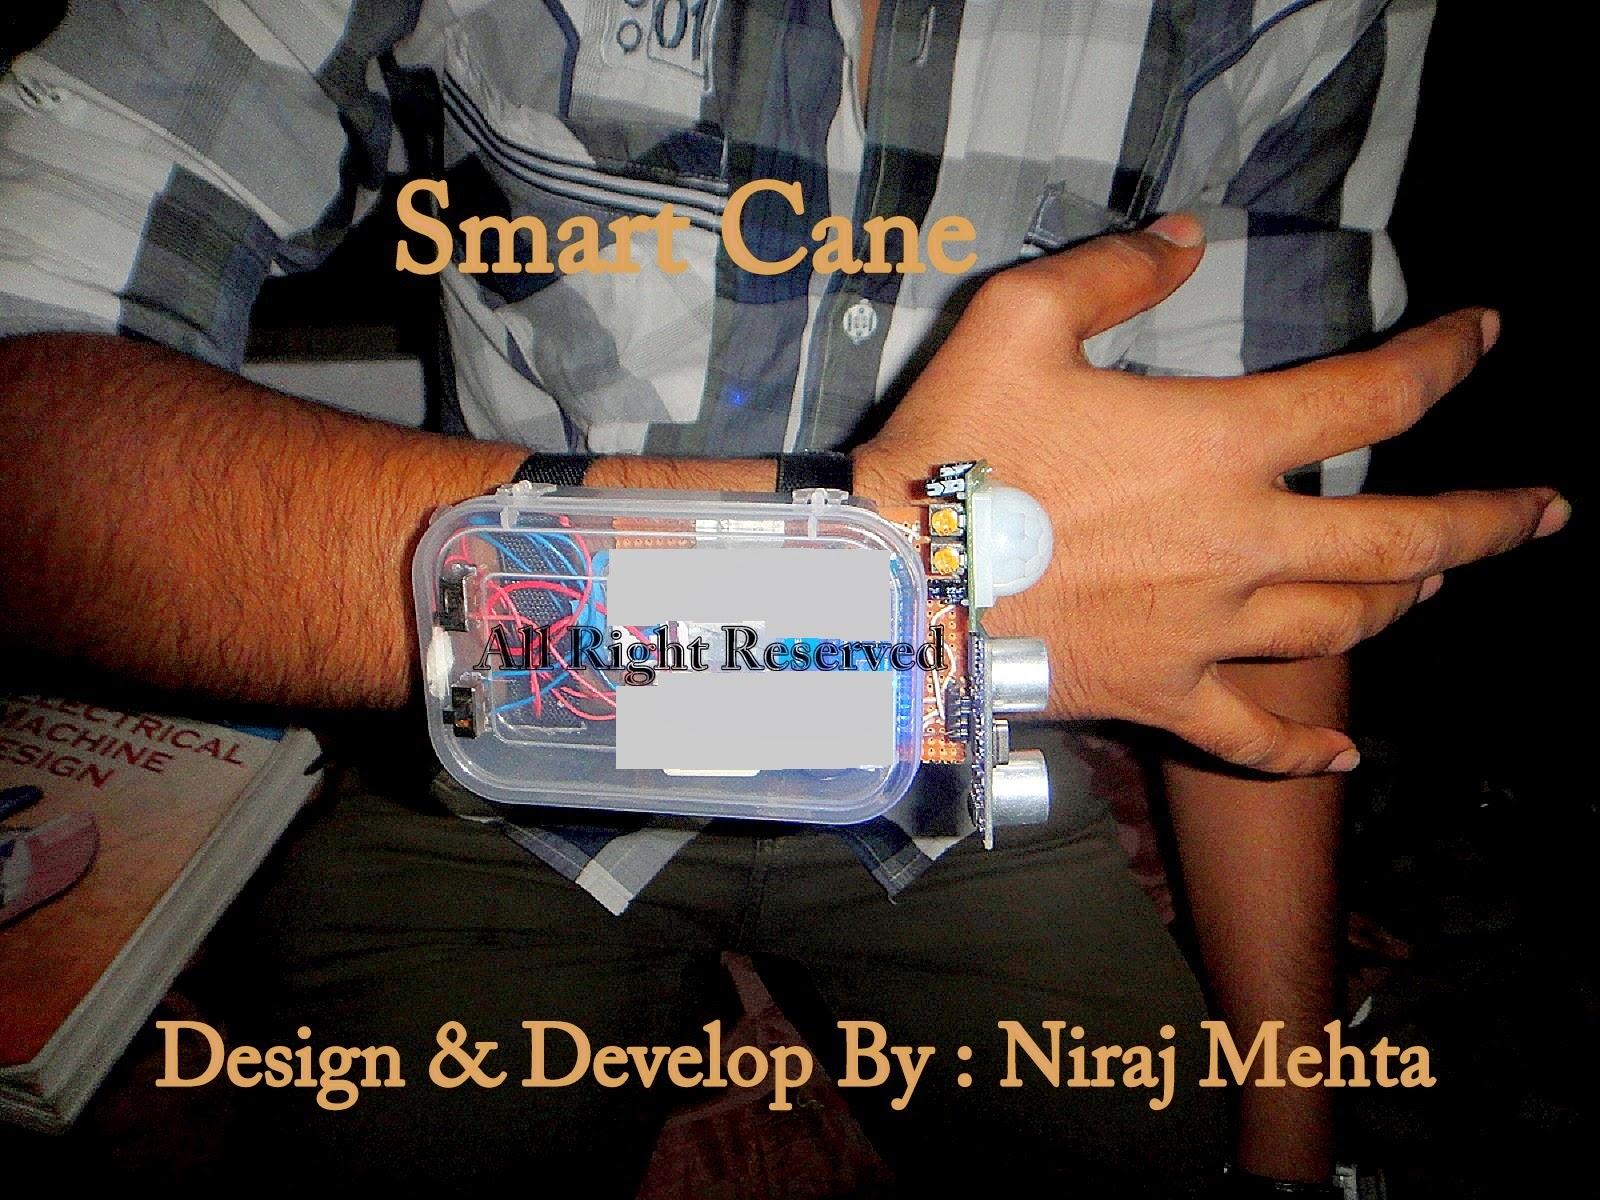 Smart Cane Project Smart Cane